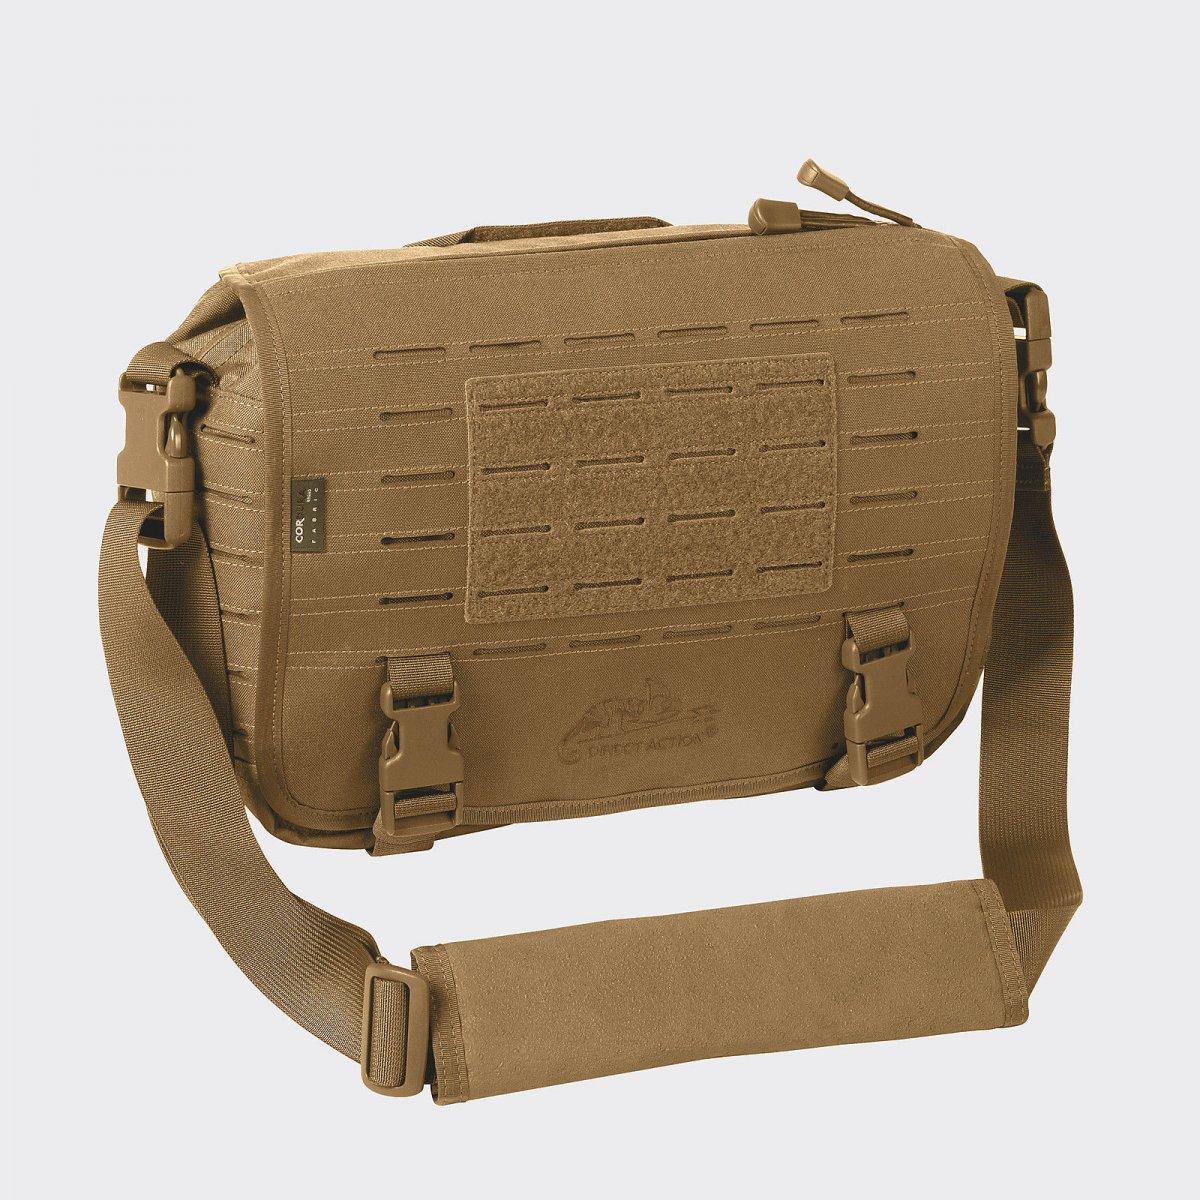 Direct-Action-Small-Messenger-Bag -Taktische-Umhaengetasche-Coyote-